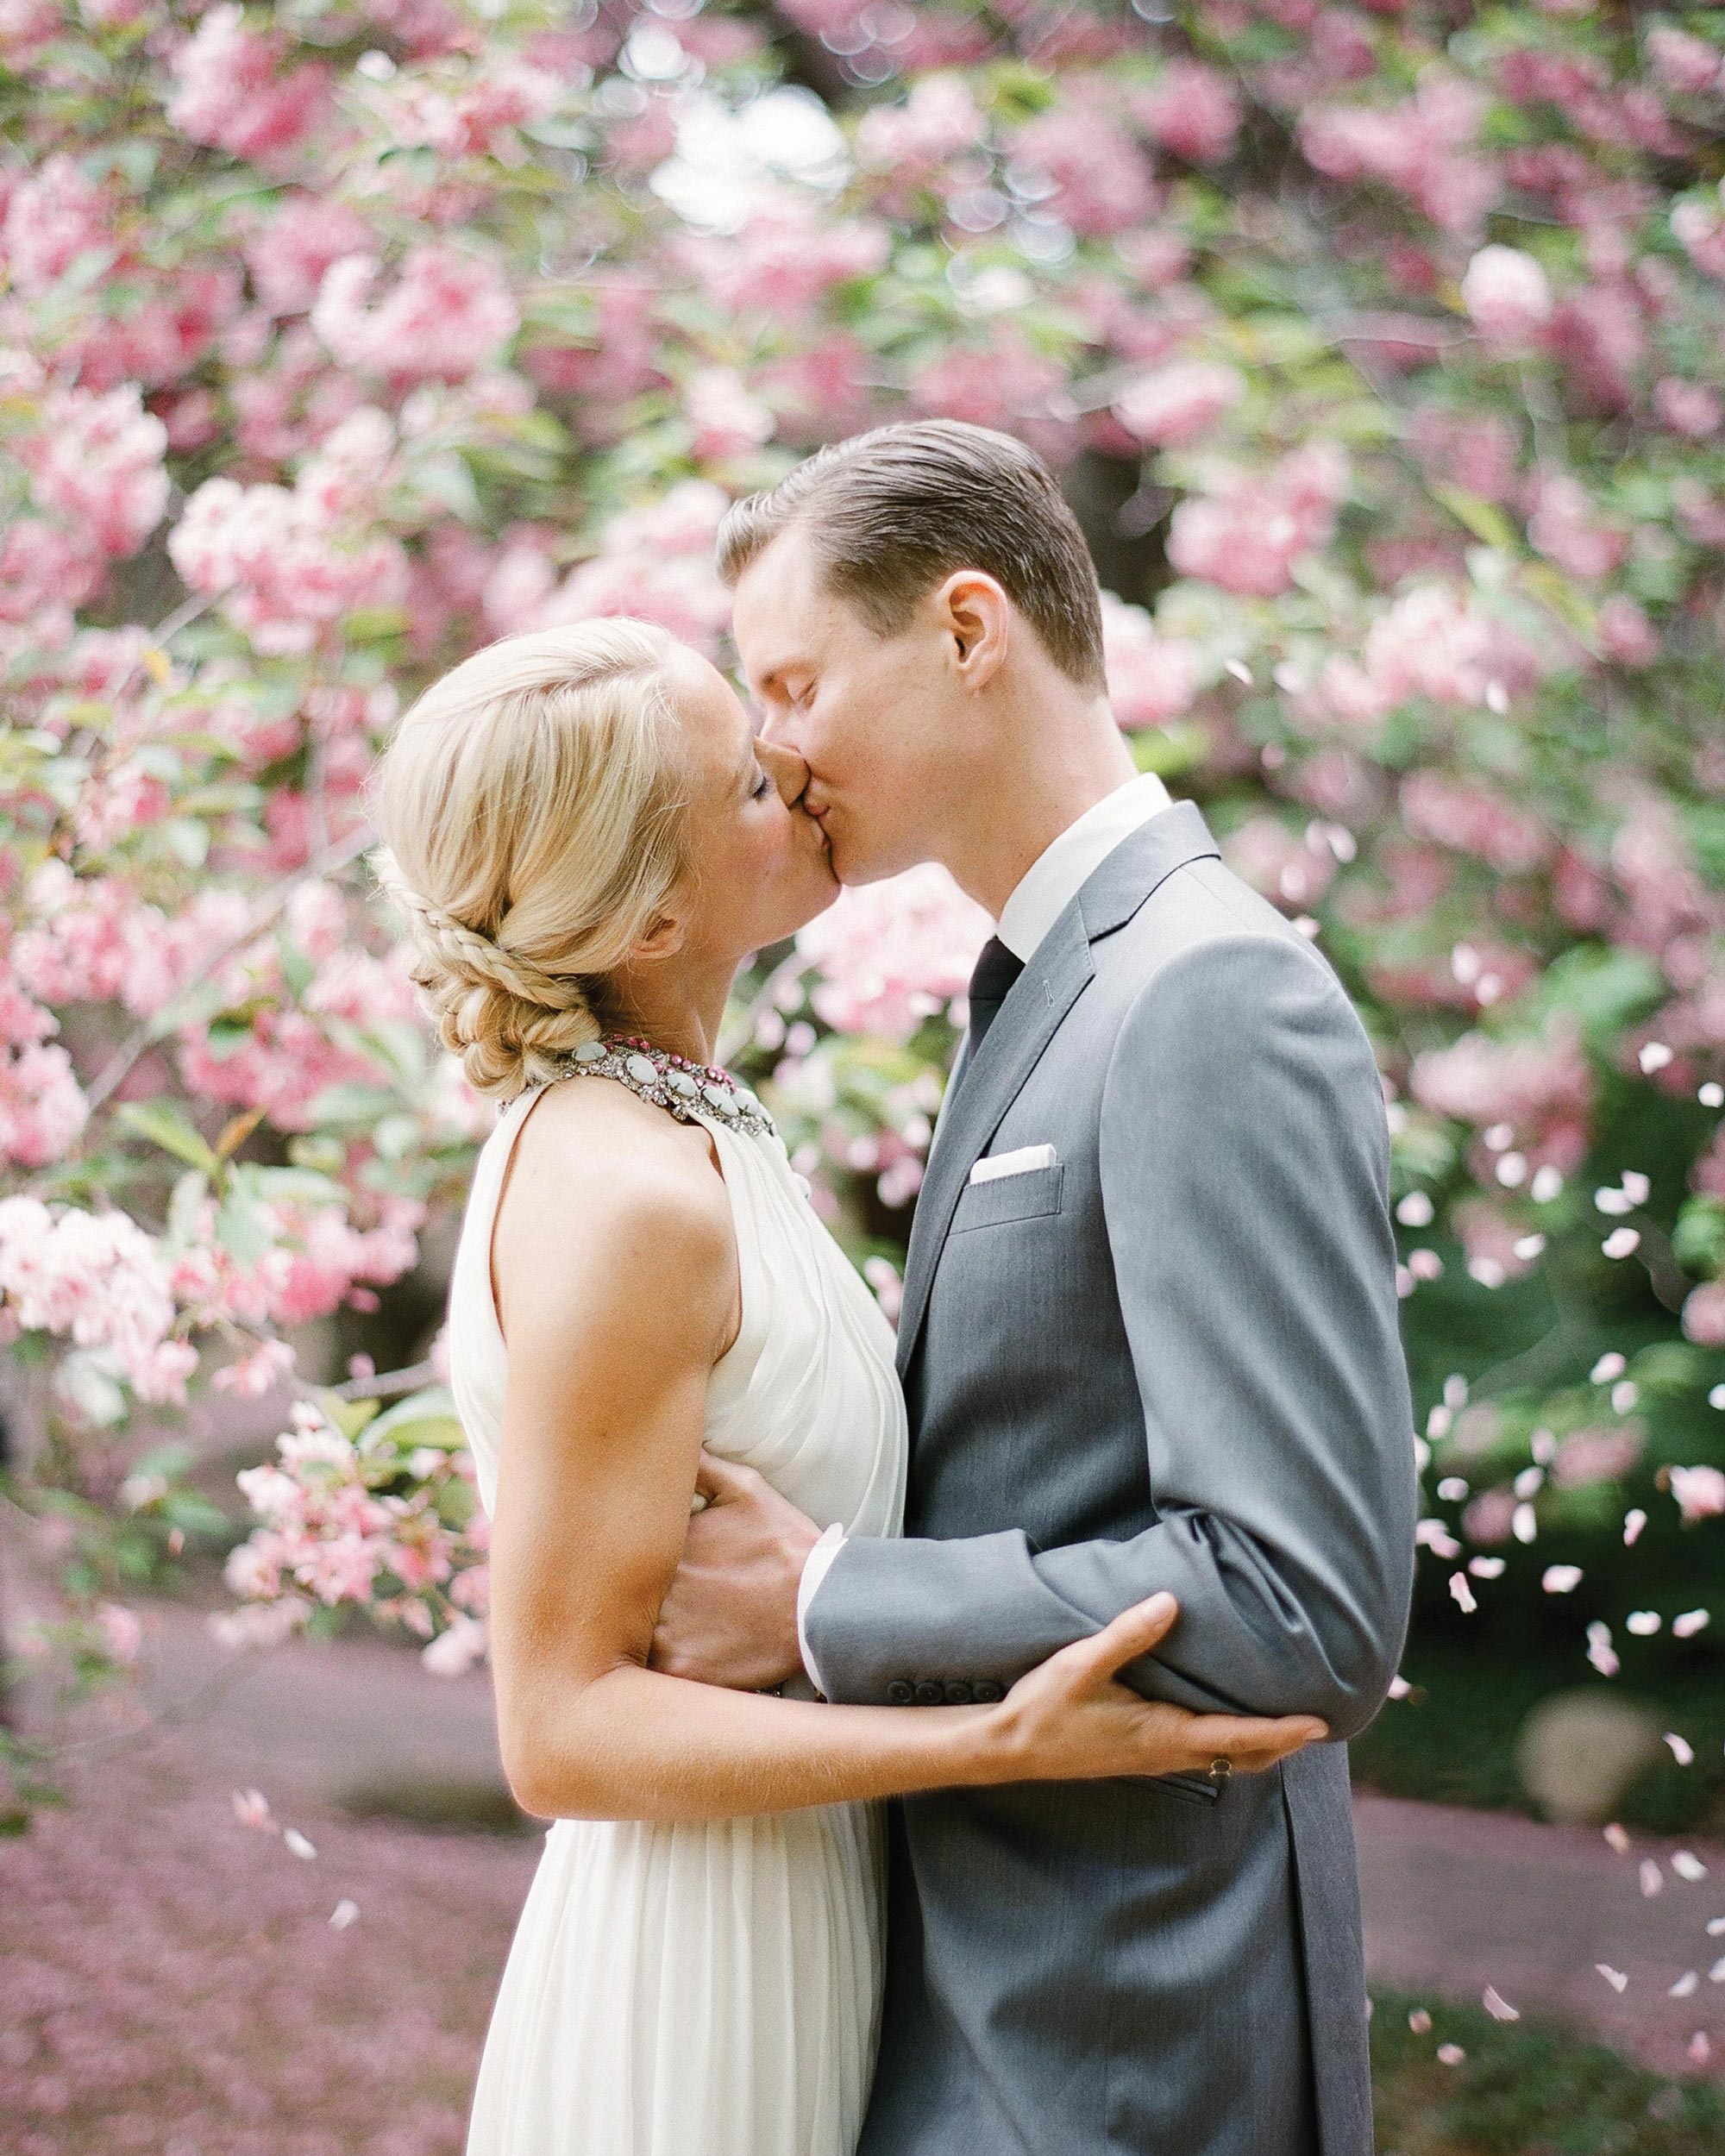 randy-mayo-real-wedding-bride-groom-kissing.jpg